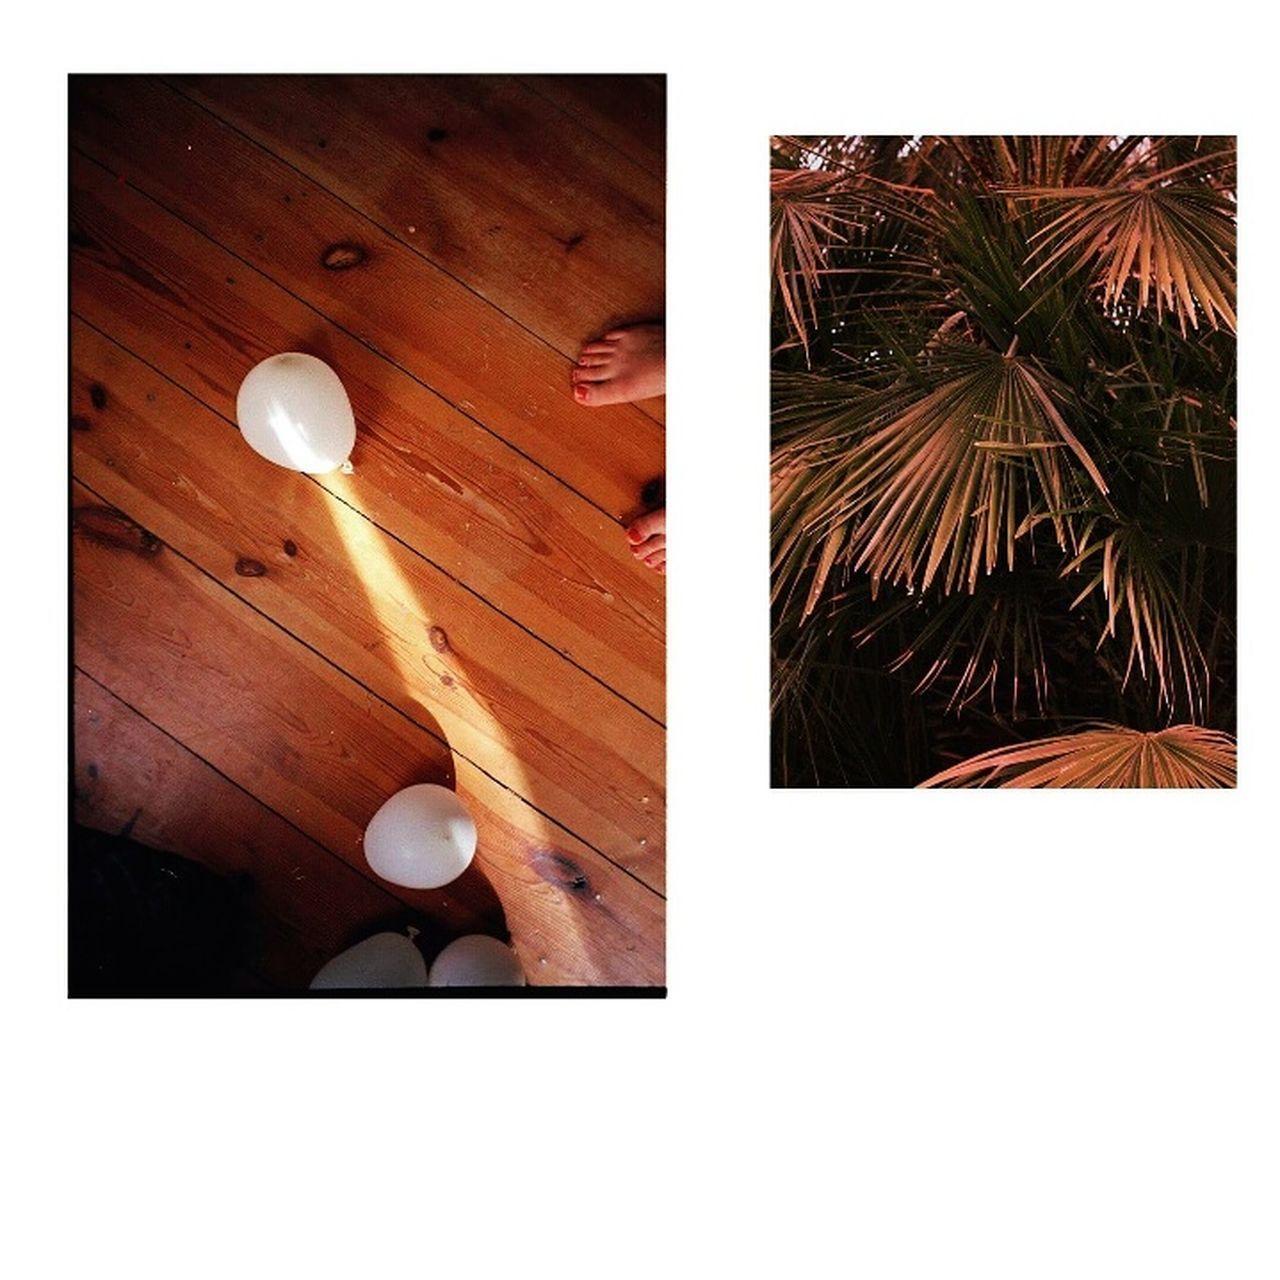 Summer ☀ Memories Palm Nature Feetselfie Kombi Love Analogue Photography Nikon Nikonphotography Mamiya No People Close-up Nature Day Outdoors First Eyeem Photo